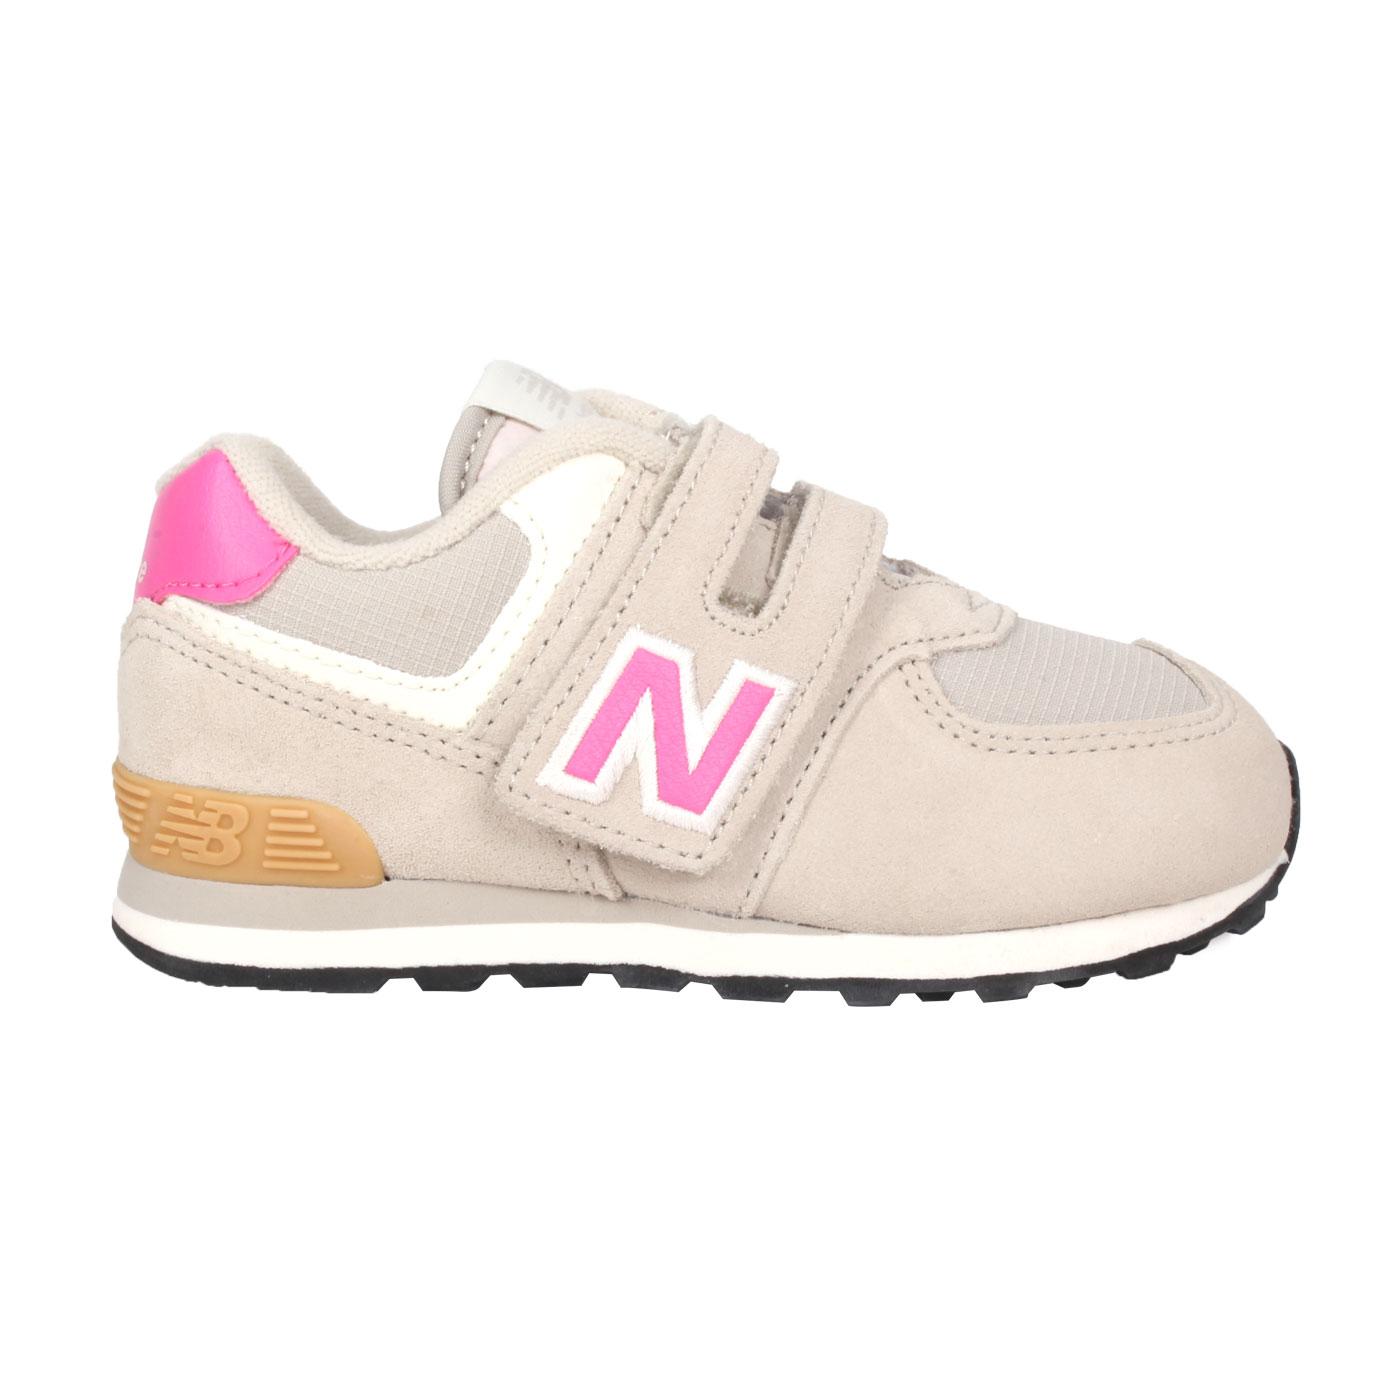 NEW BALANCE 小童休閒運動鞋 IV574ME2 - 淺灰桃紅